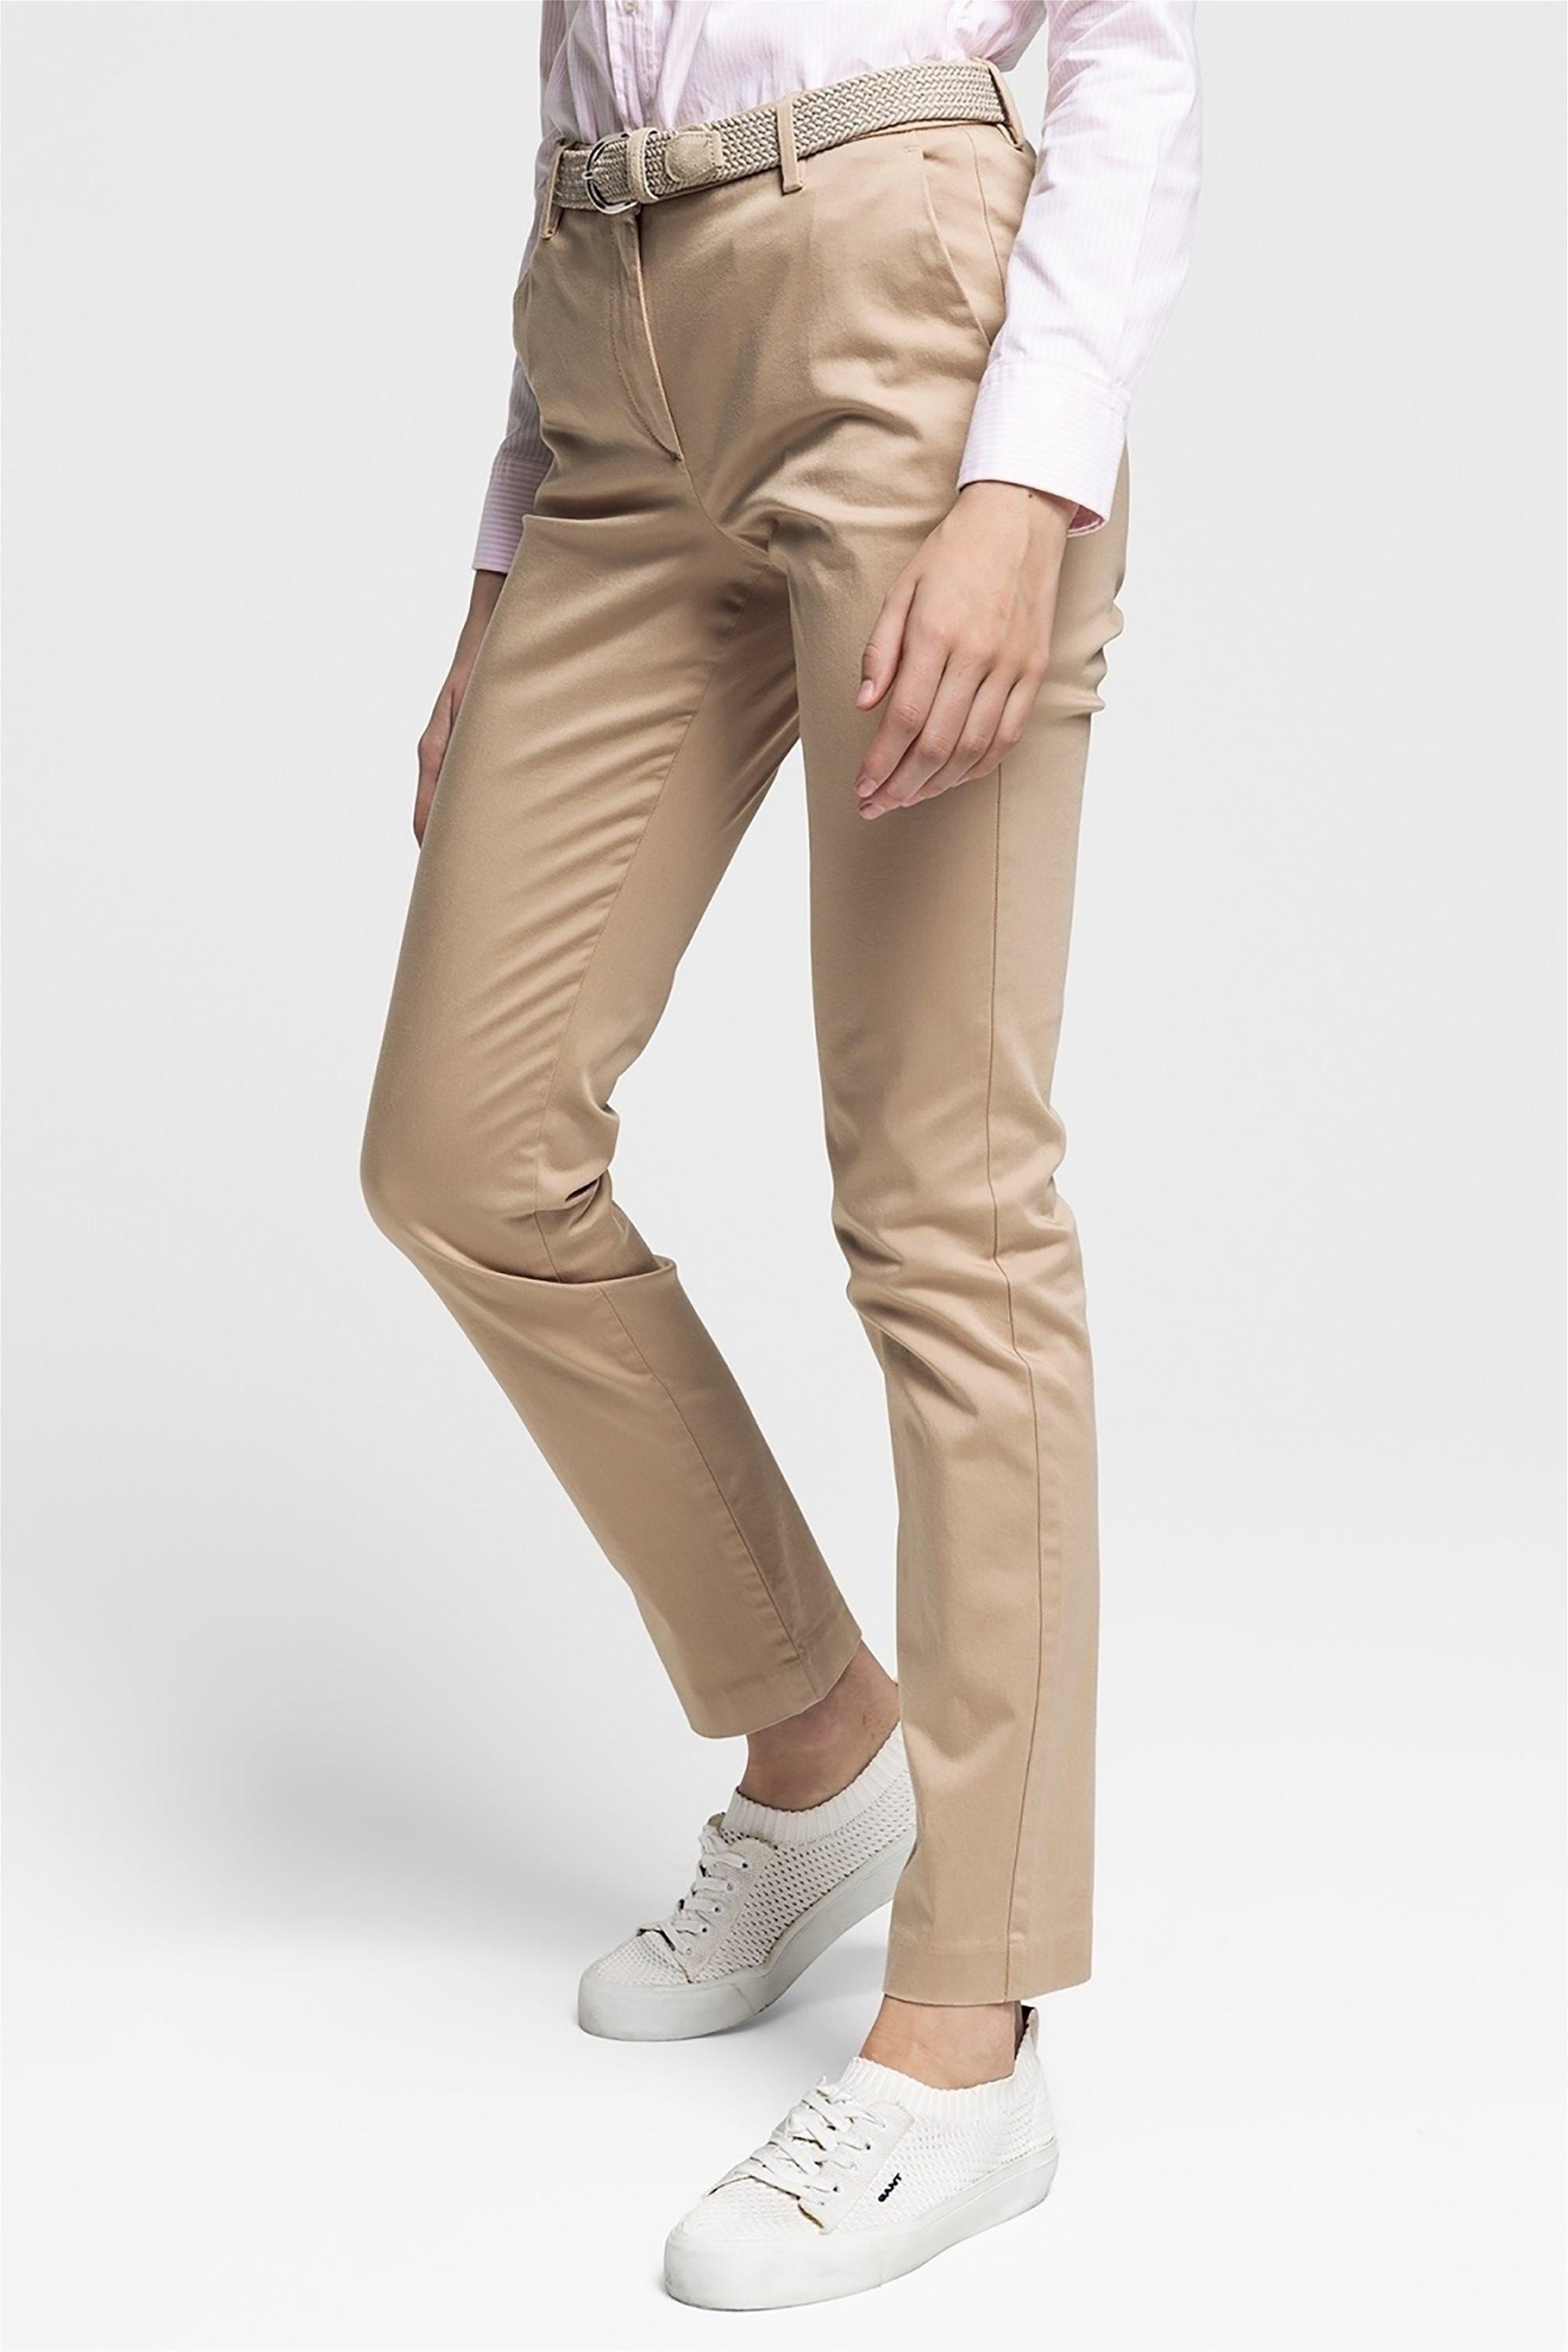 8da988592c43 Notos Gant γυναικείο παντελόνι chino cropped - 4150077 - Μπεζ